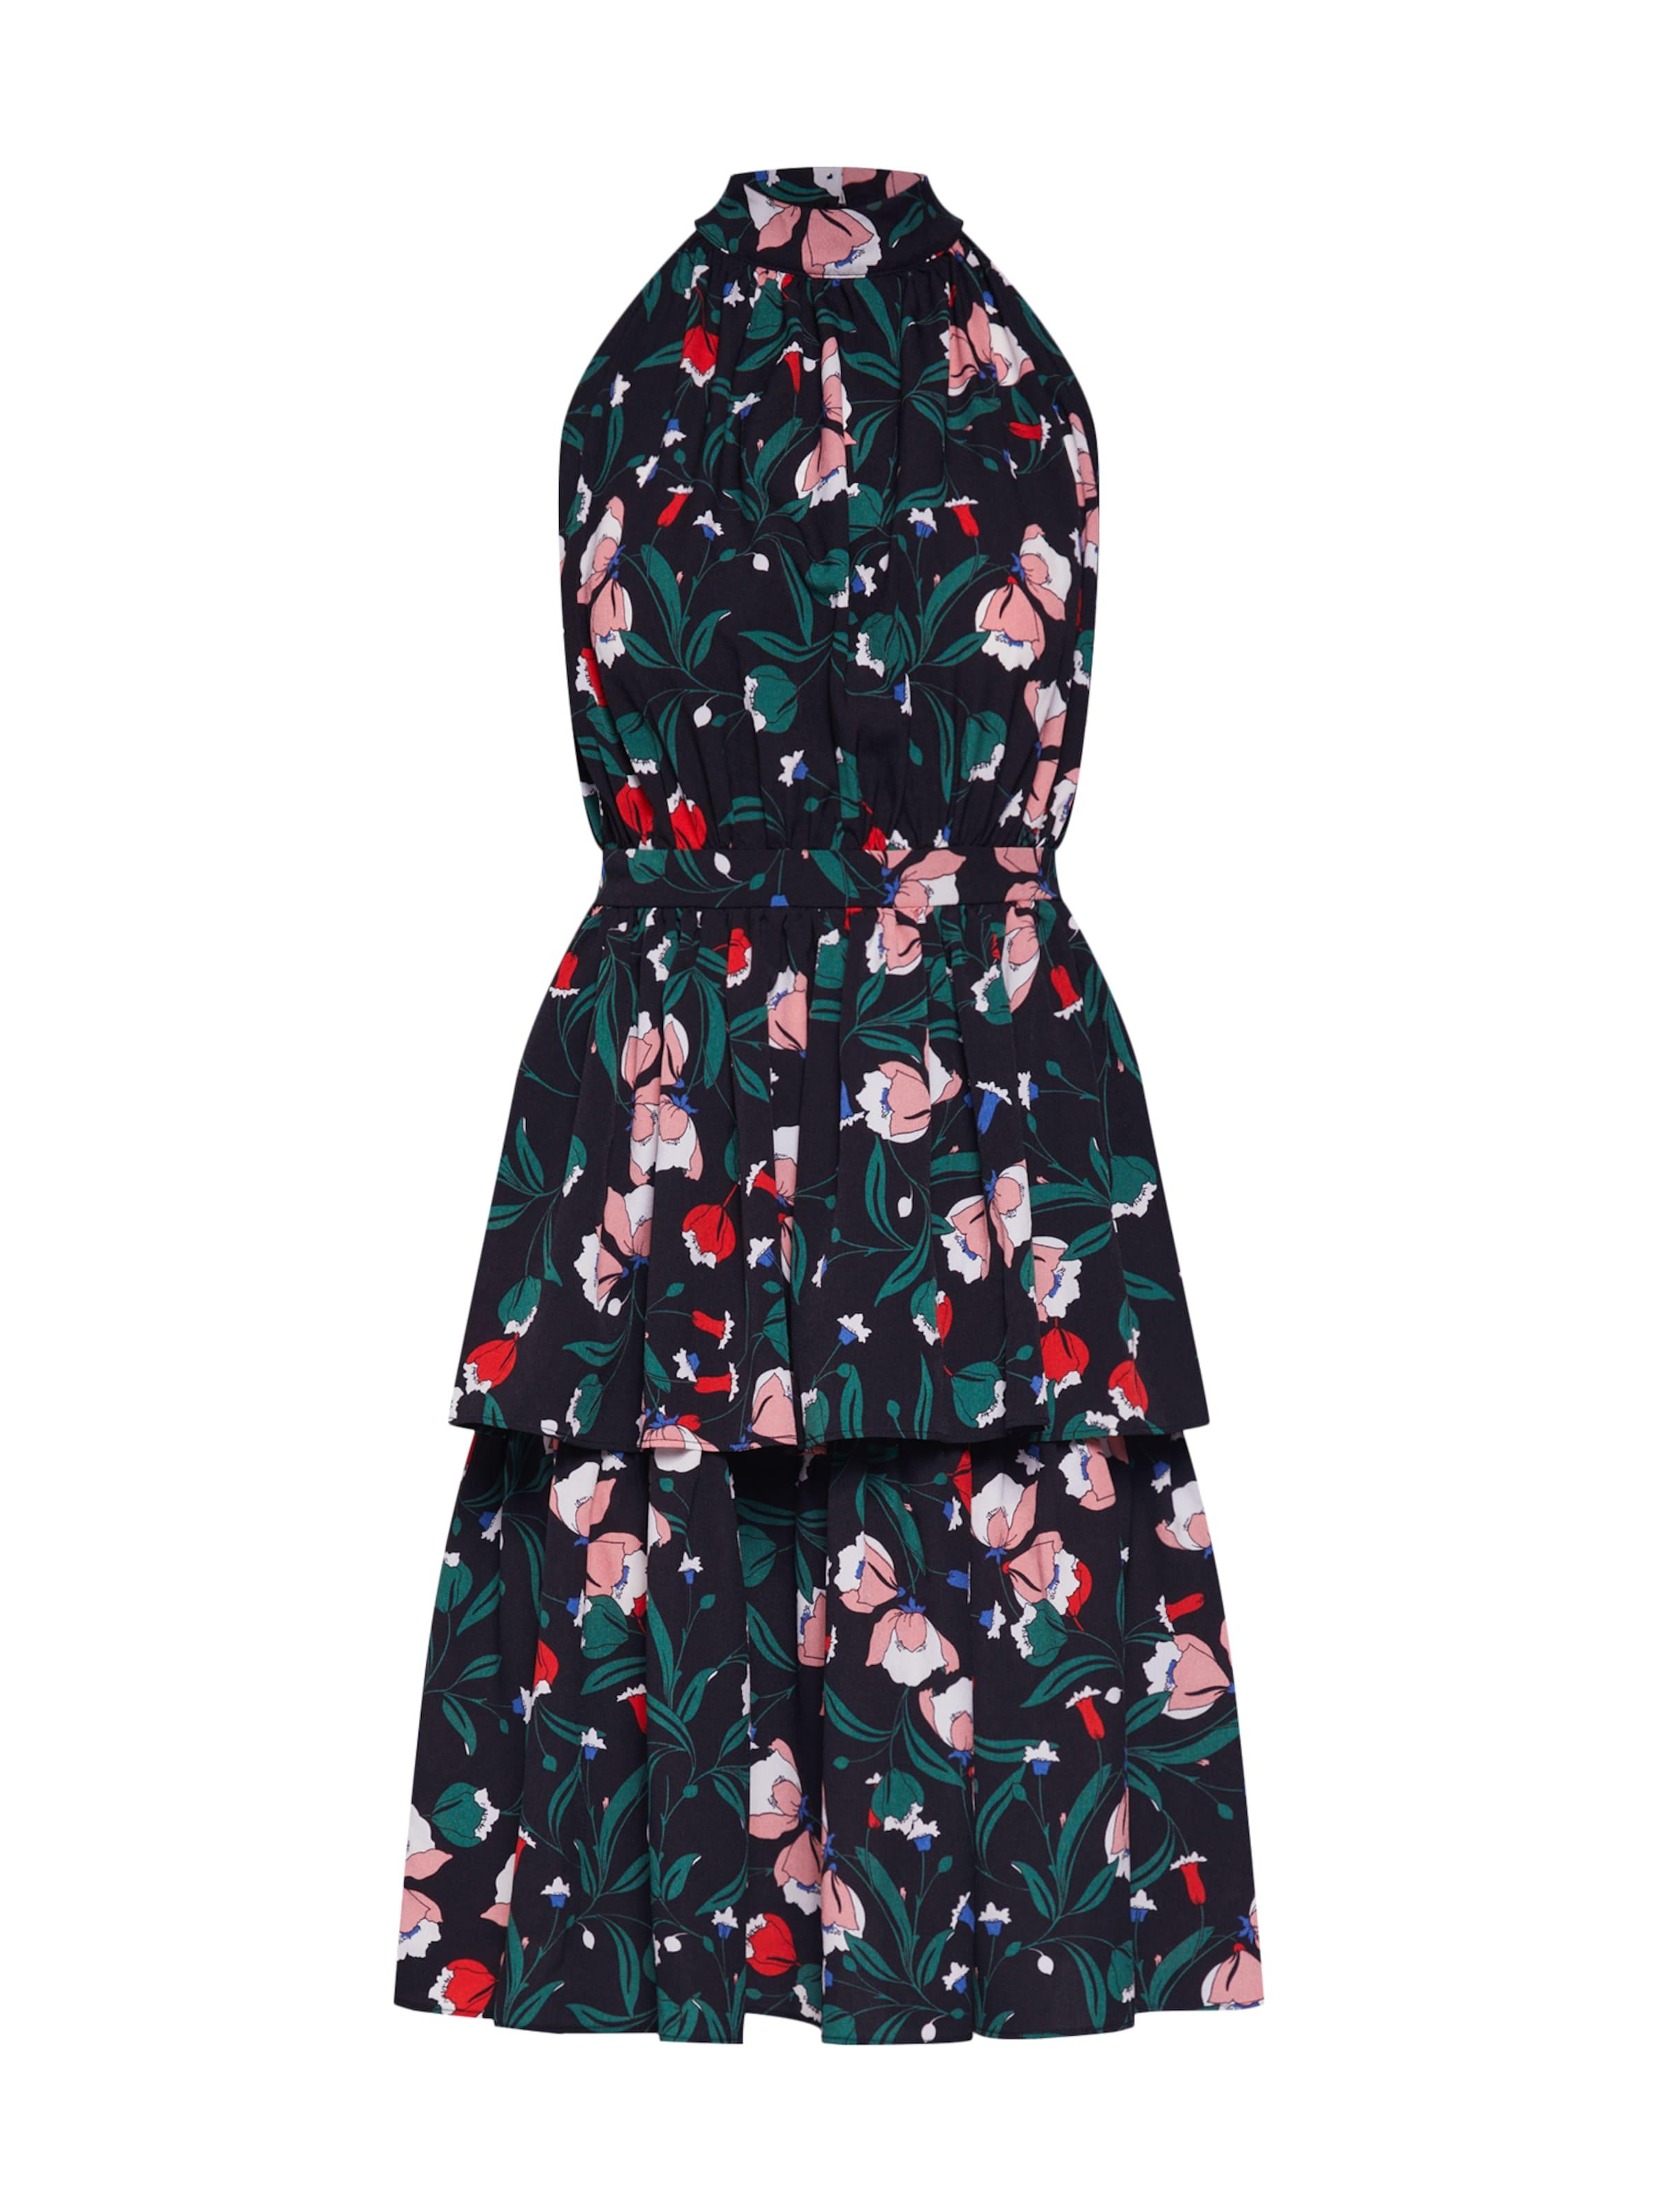 For You About In Michalsky Oxbedcr Kleid 'kira Mischfarbenschwarz Dress' gvf6ybY7